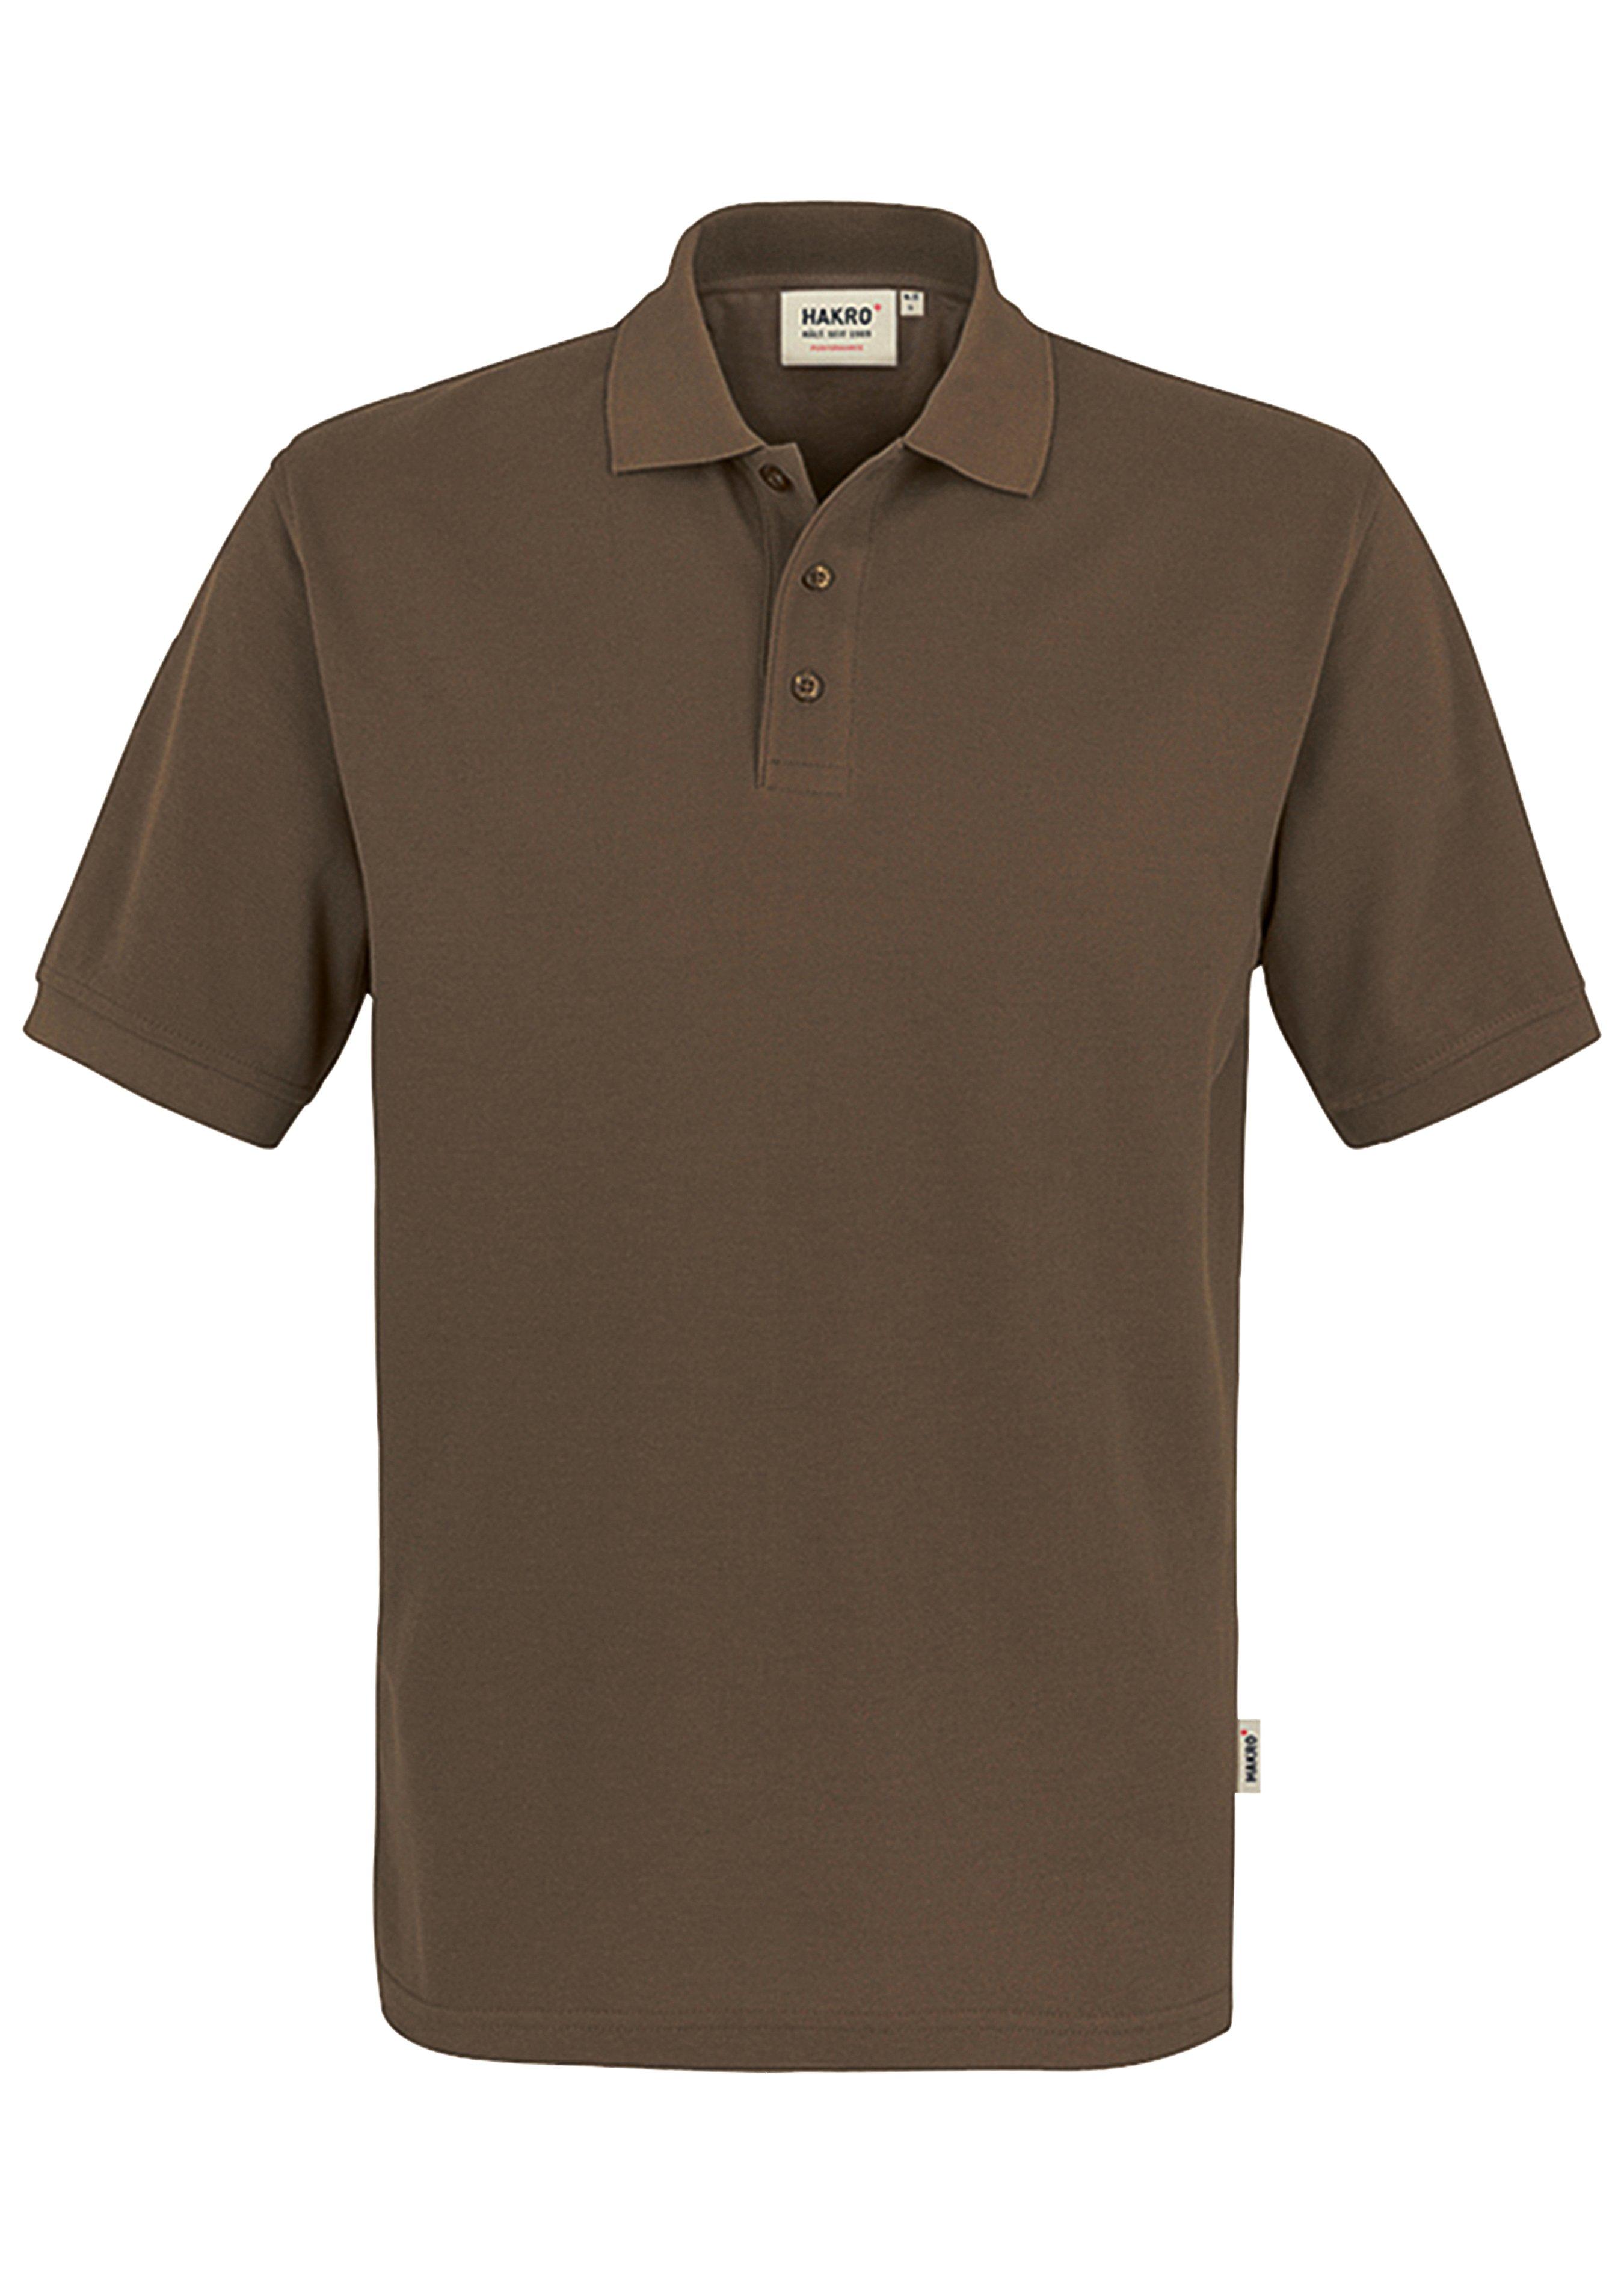 Hakro Strapazierfähiges Poloshirt in 9 Farben 2001404XL 1